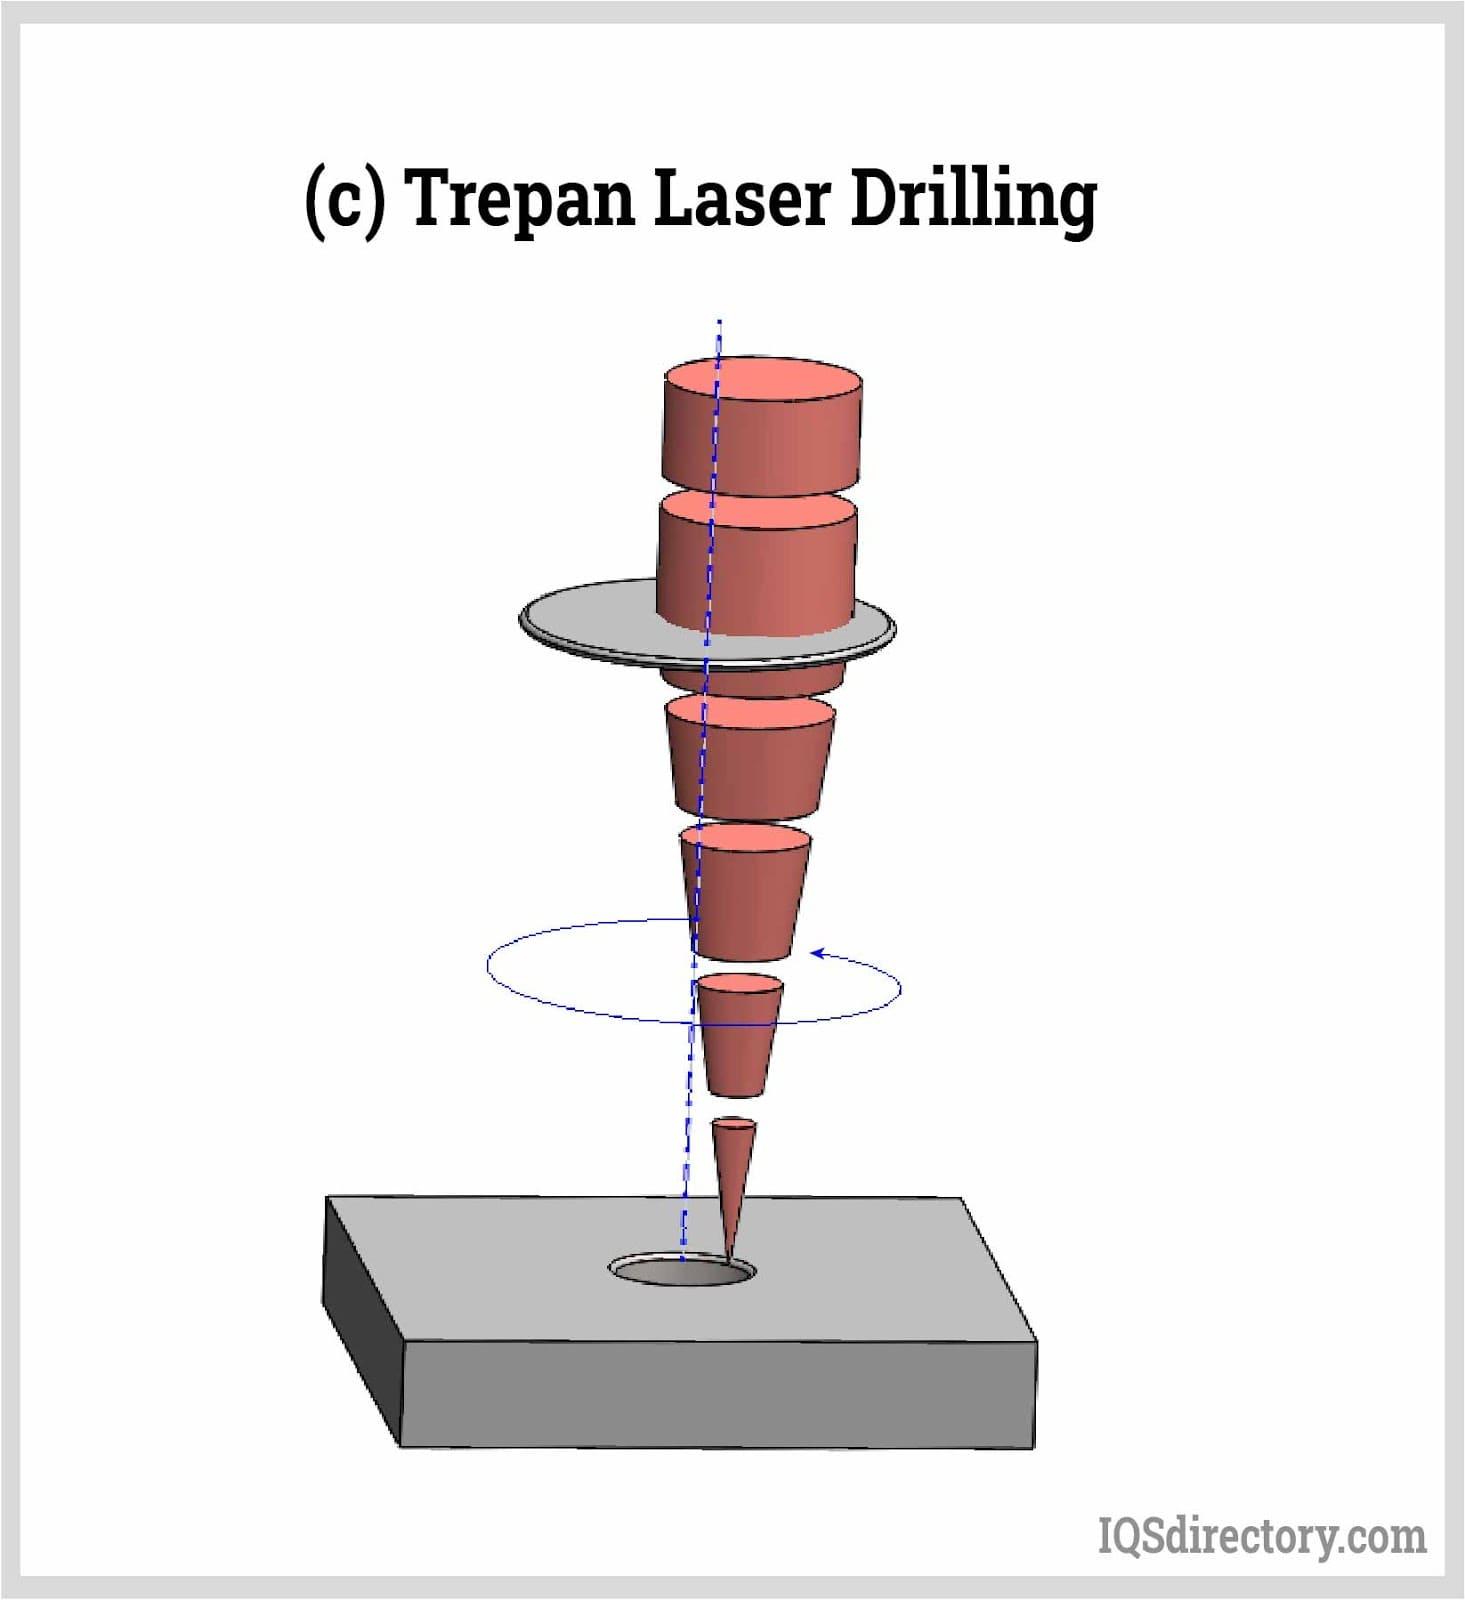 Trepan Laser Drilling